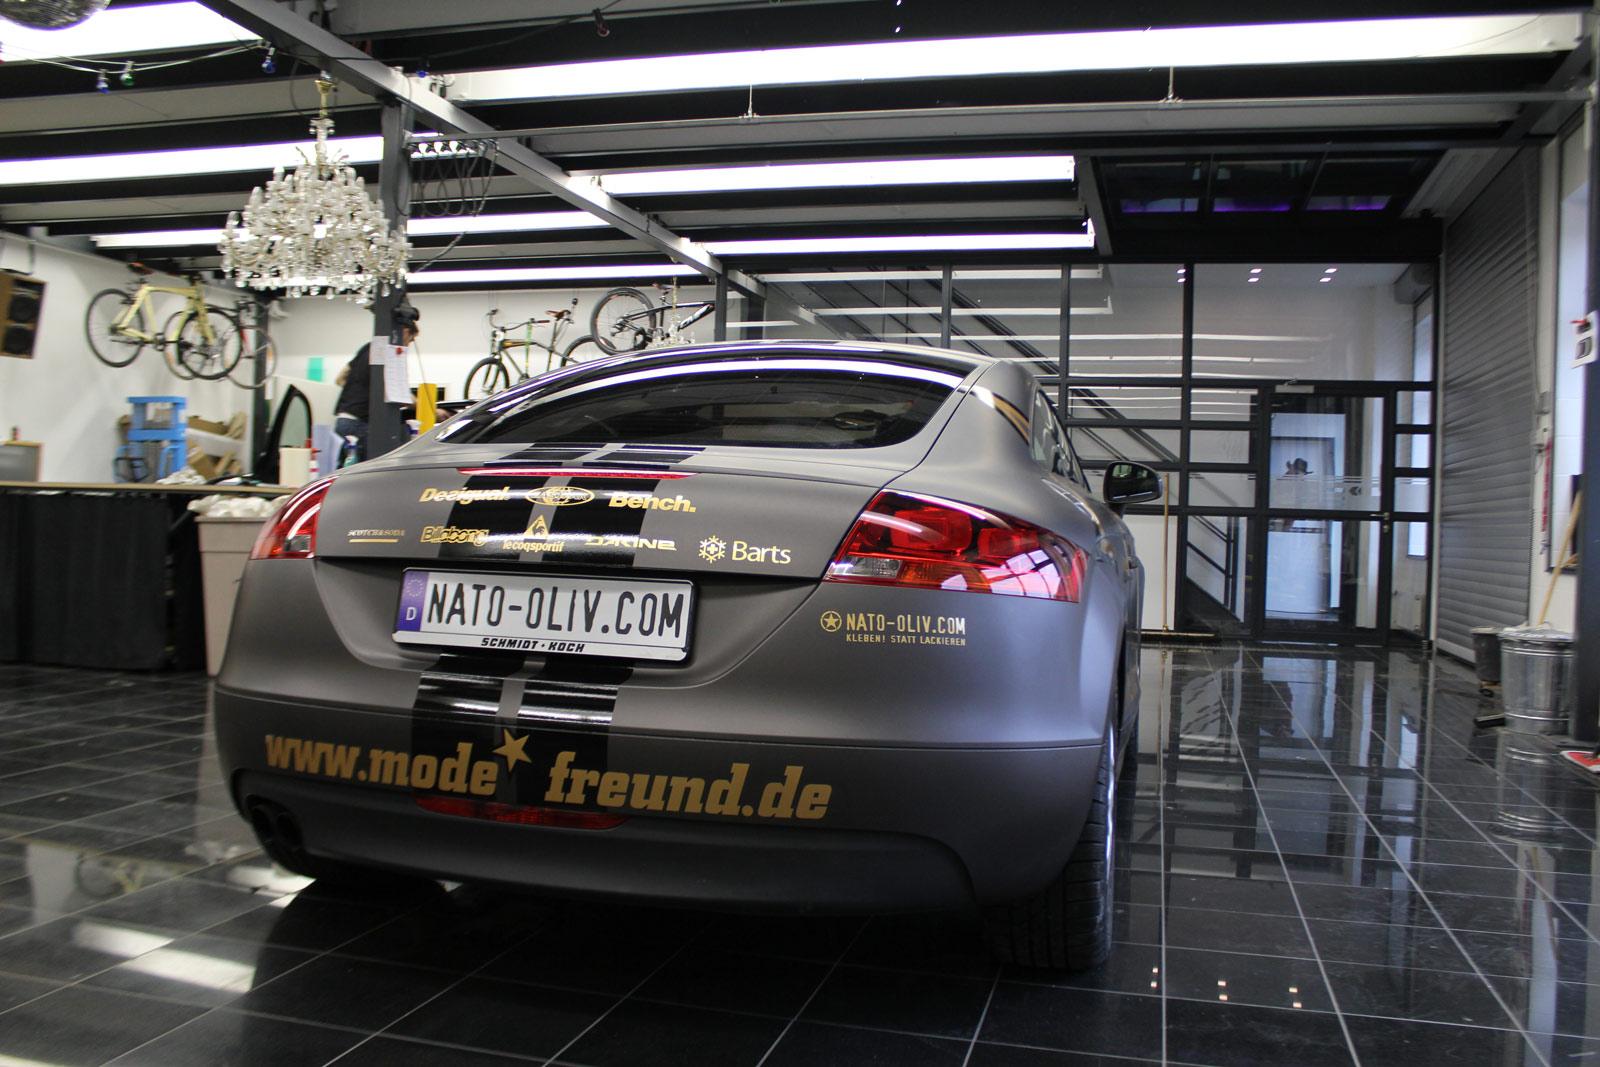 Audi_TT_Braun_Matt_Metallic_Branding_17